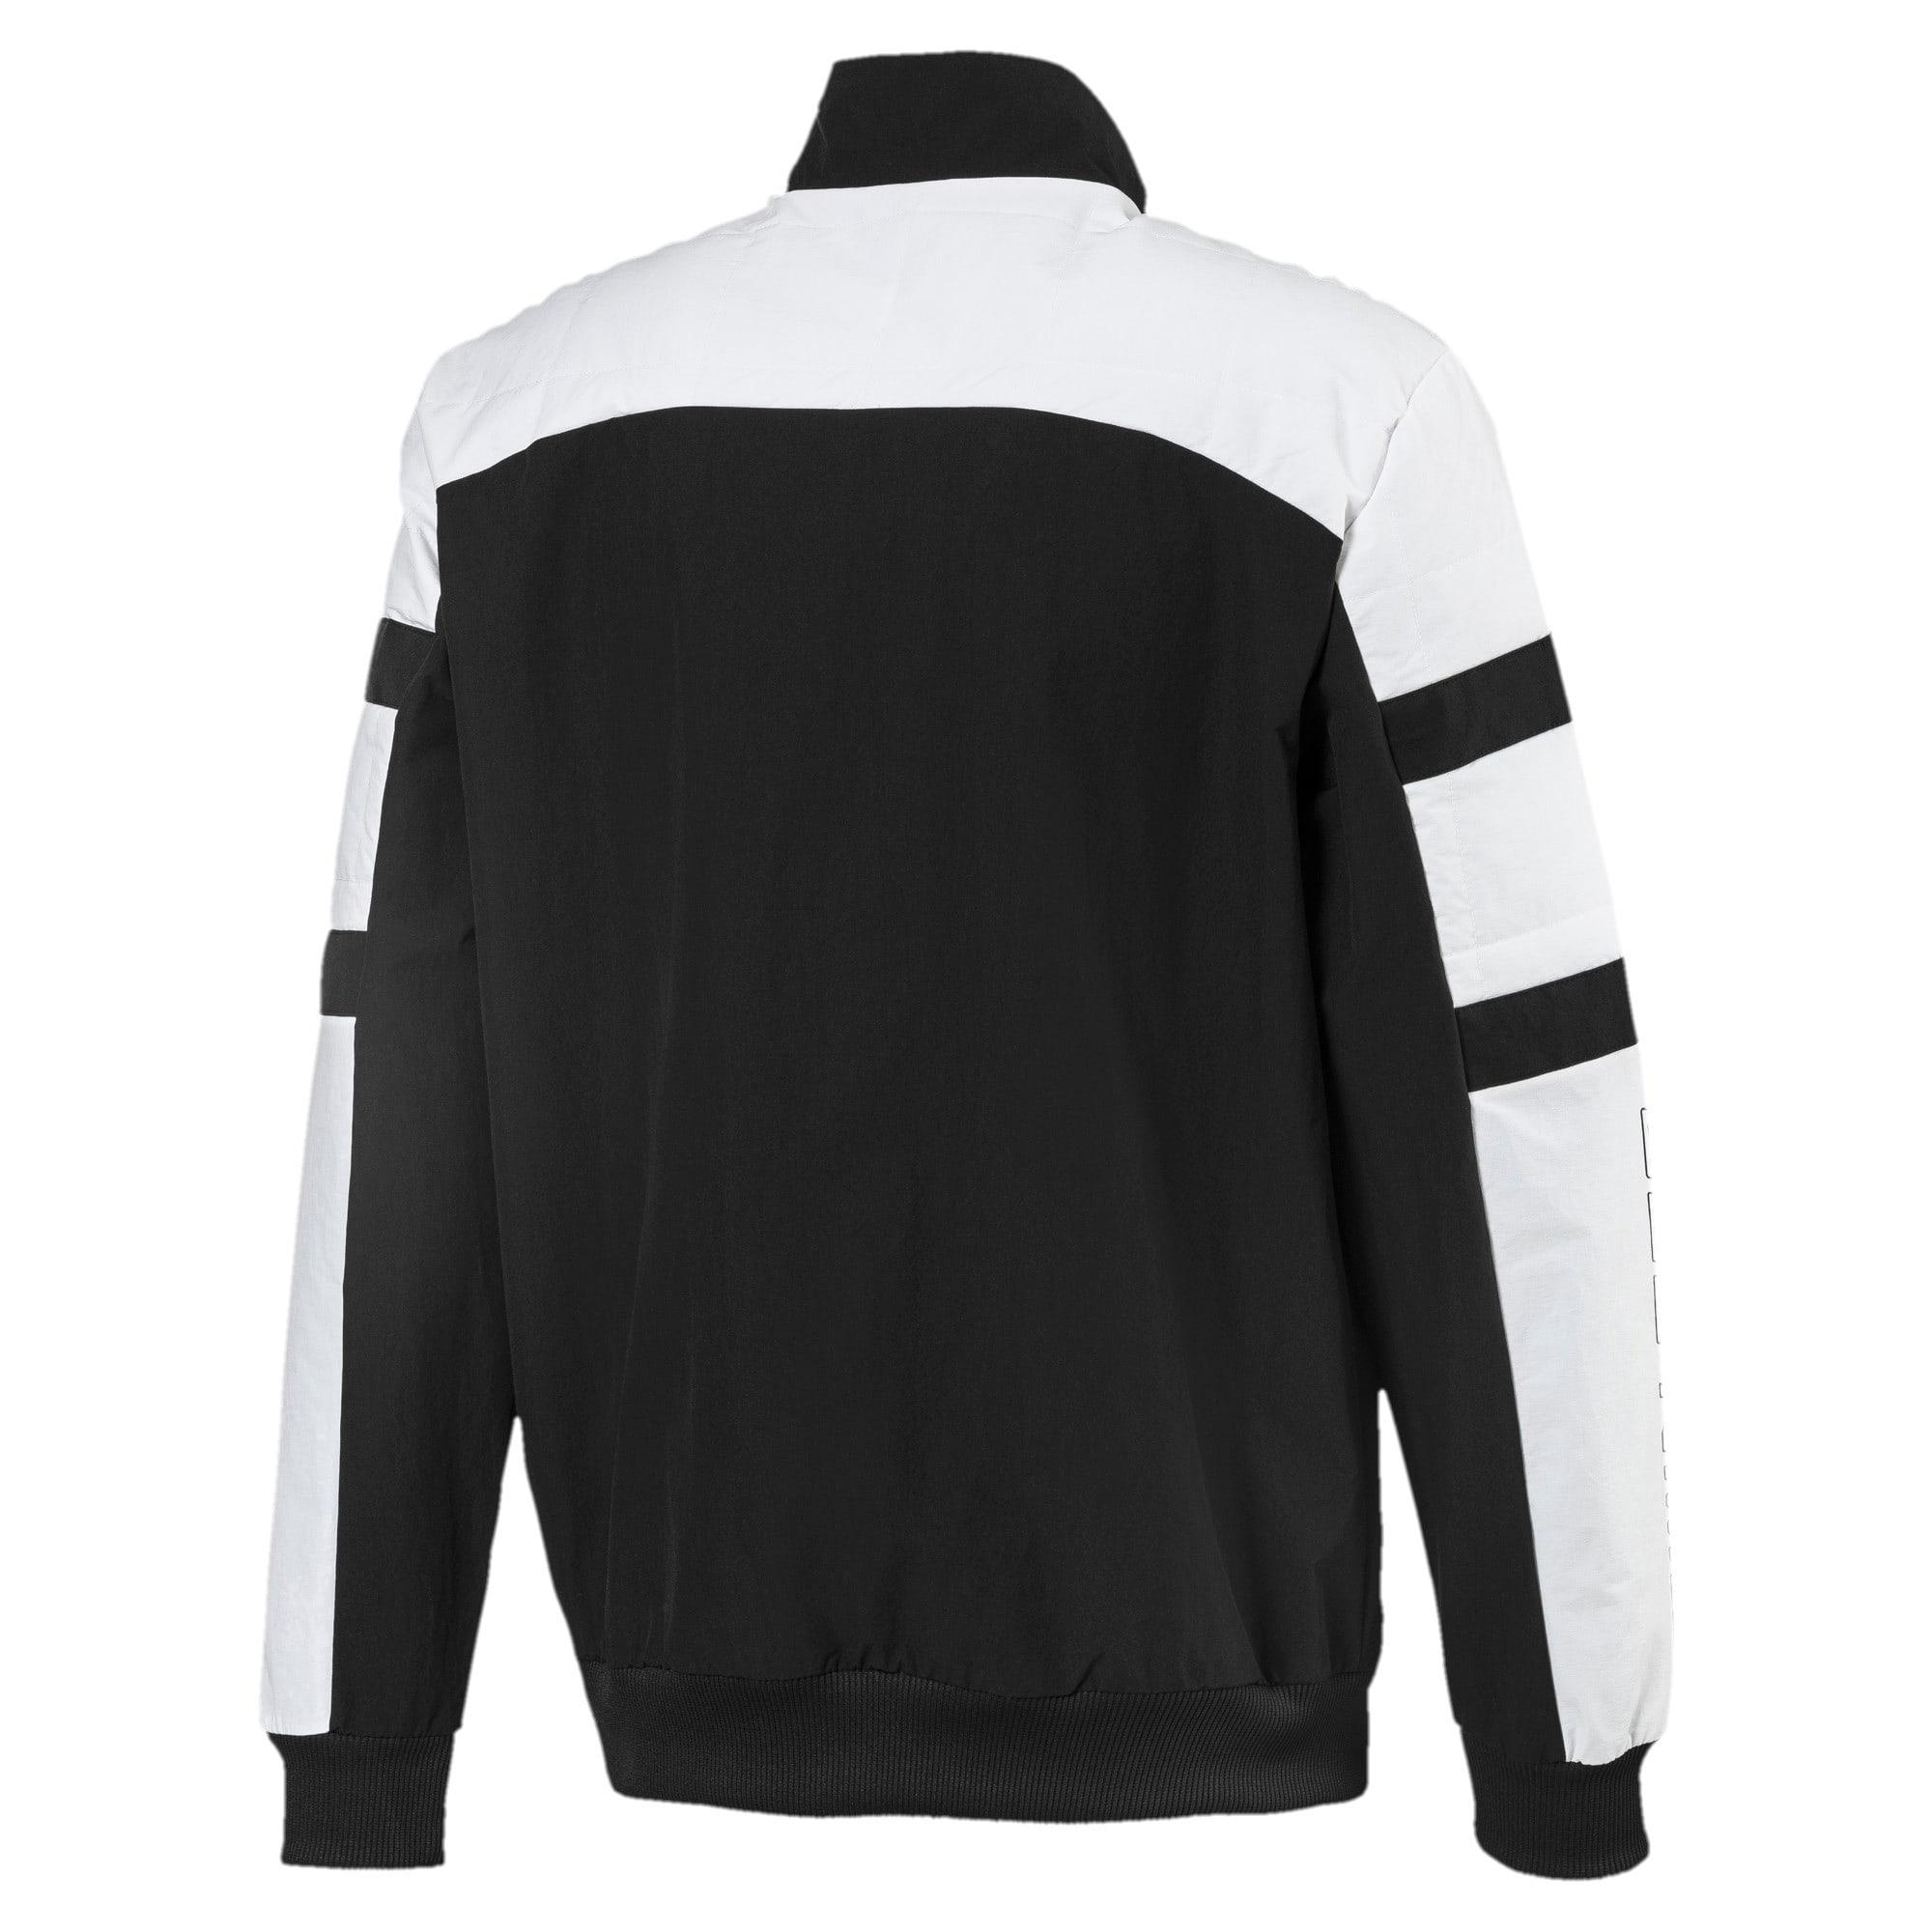 Thumbnail 5 of BMW Motorsport Street Woven Men's Jacket, Puma Black, medium